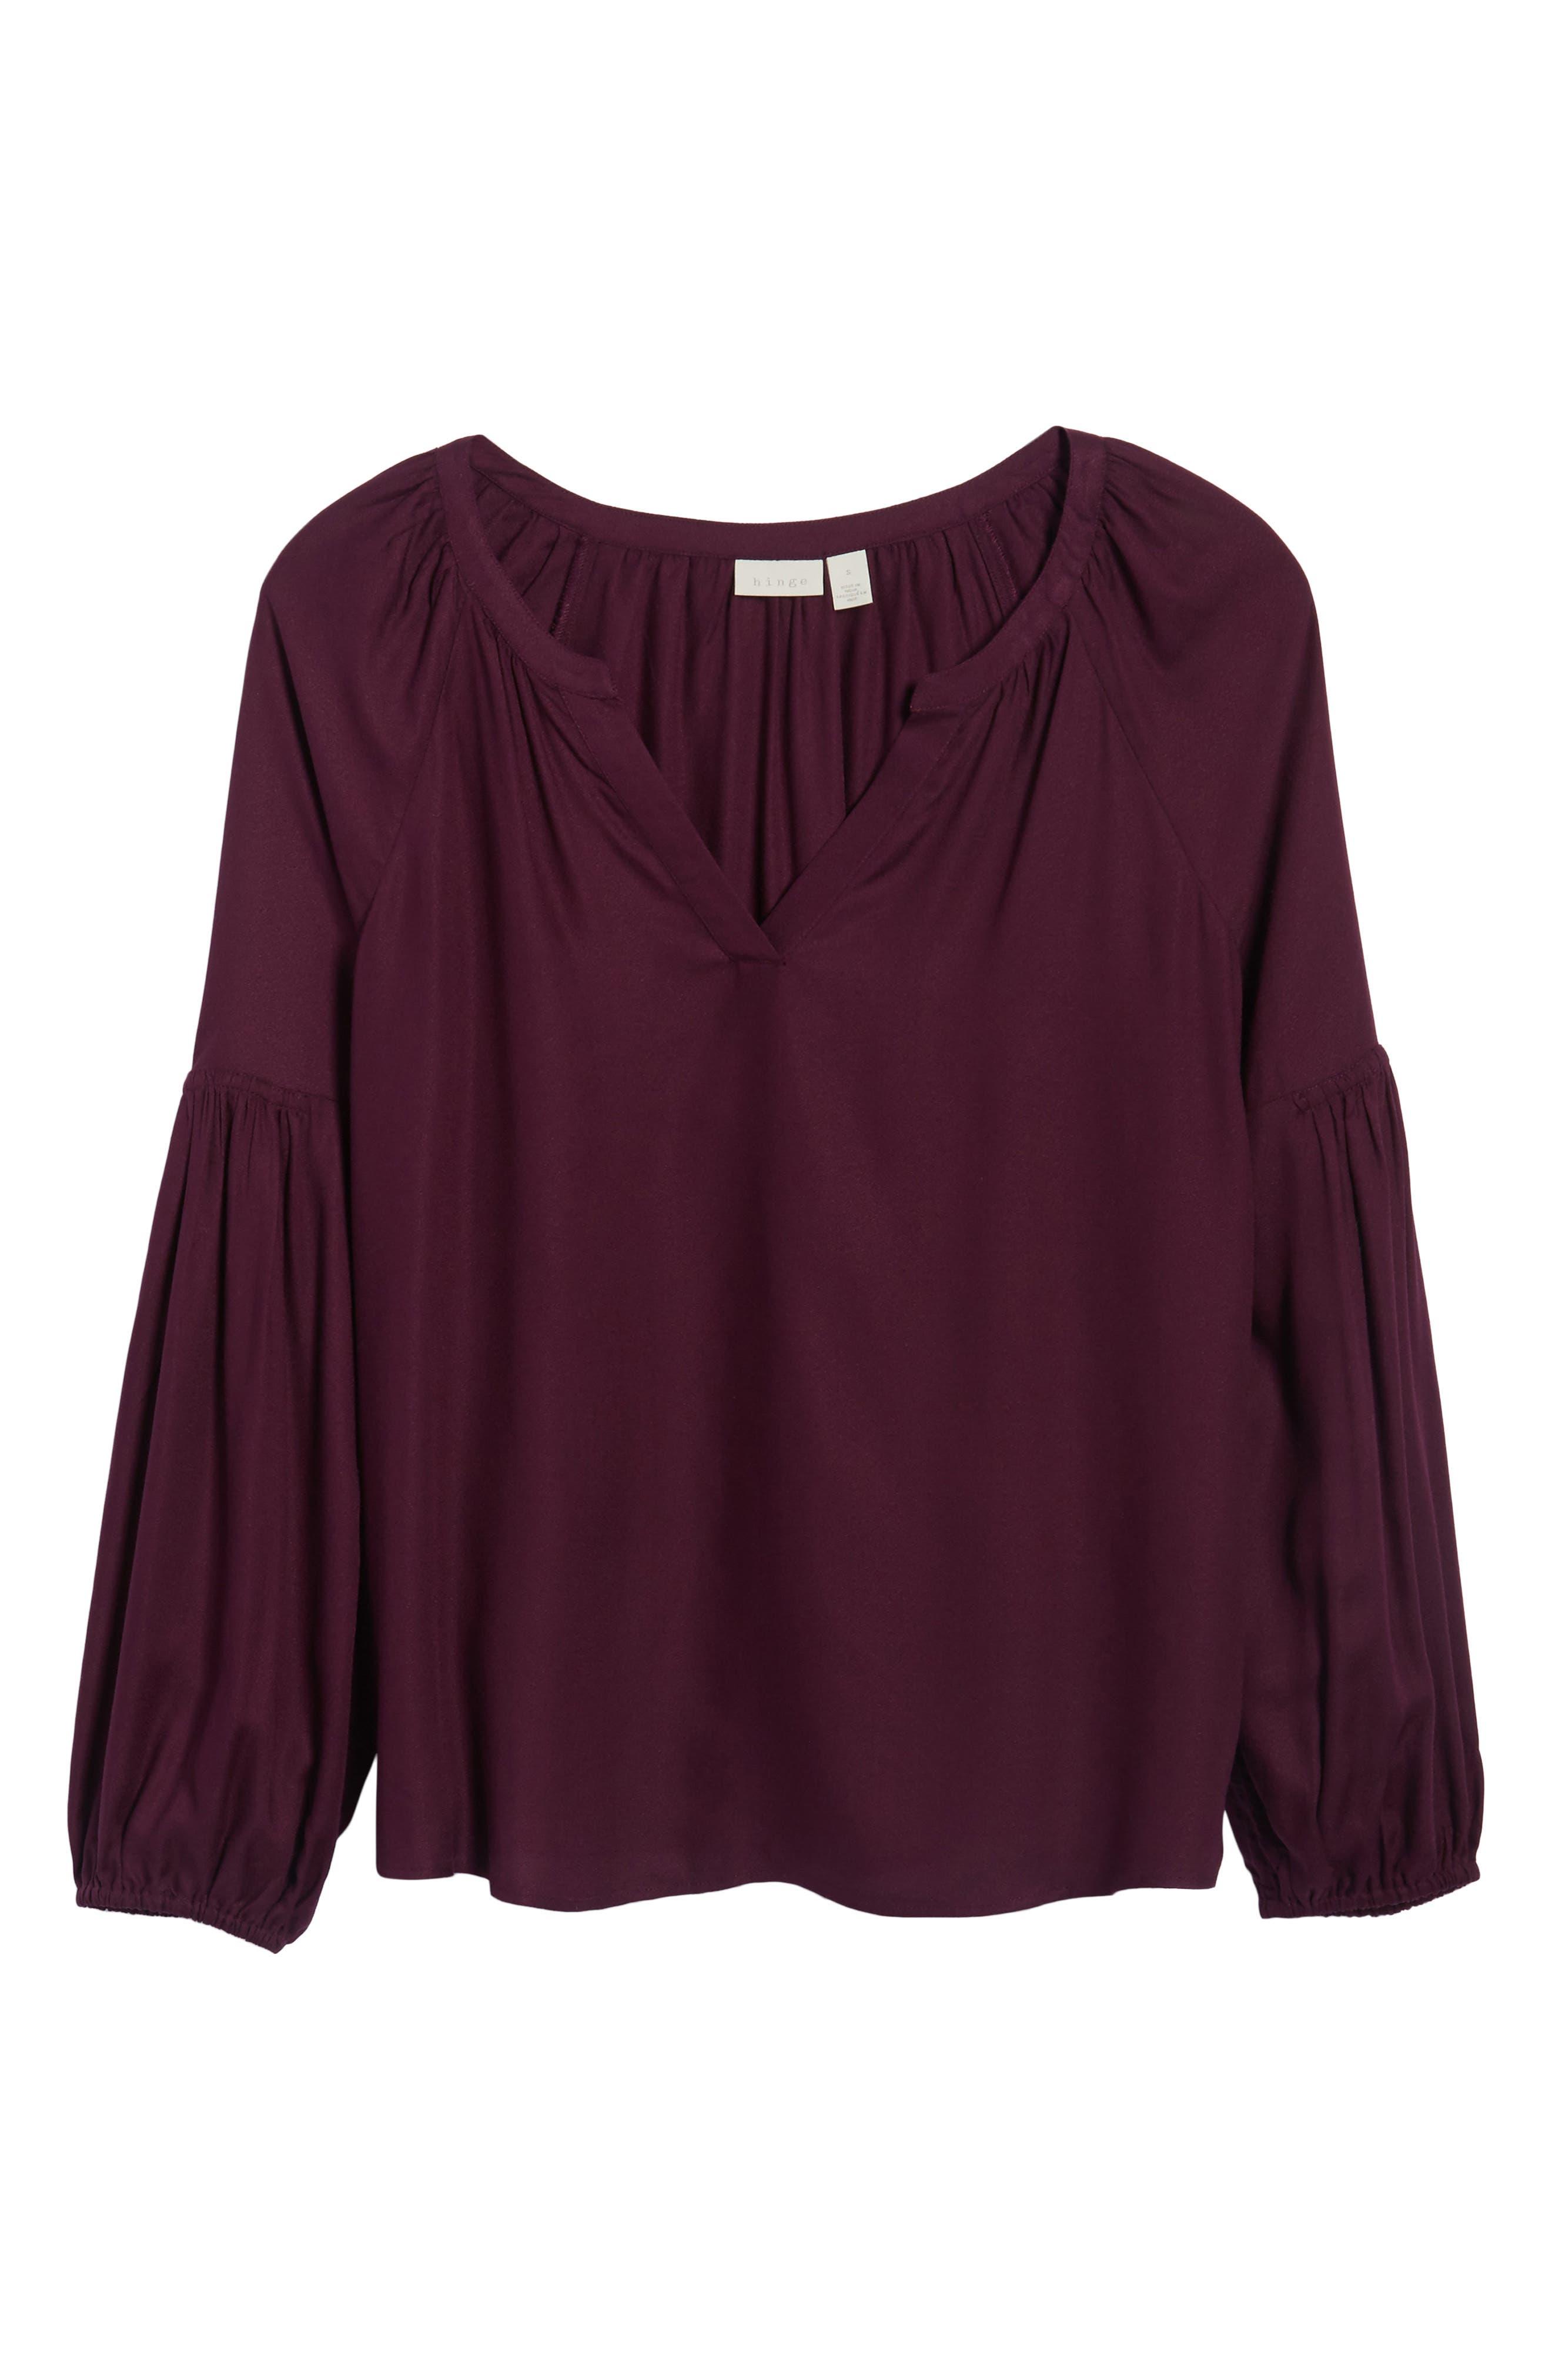 Blouson Sleeve Top,                             Alternate thumbnail 6, color,                             Purple Potent